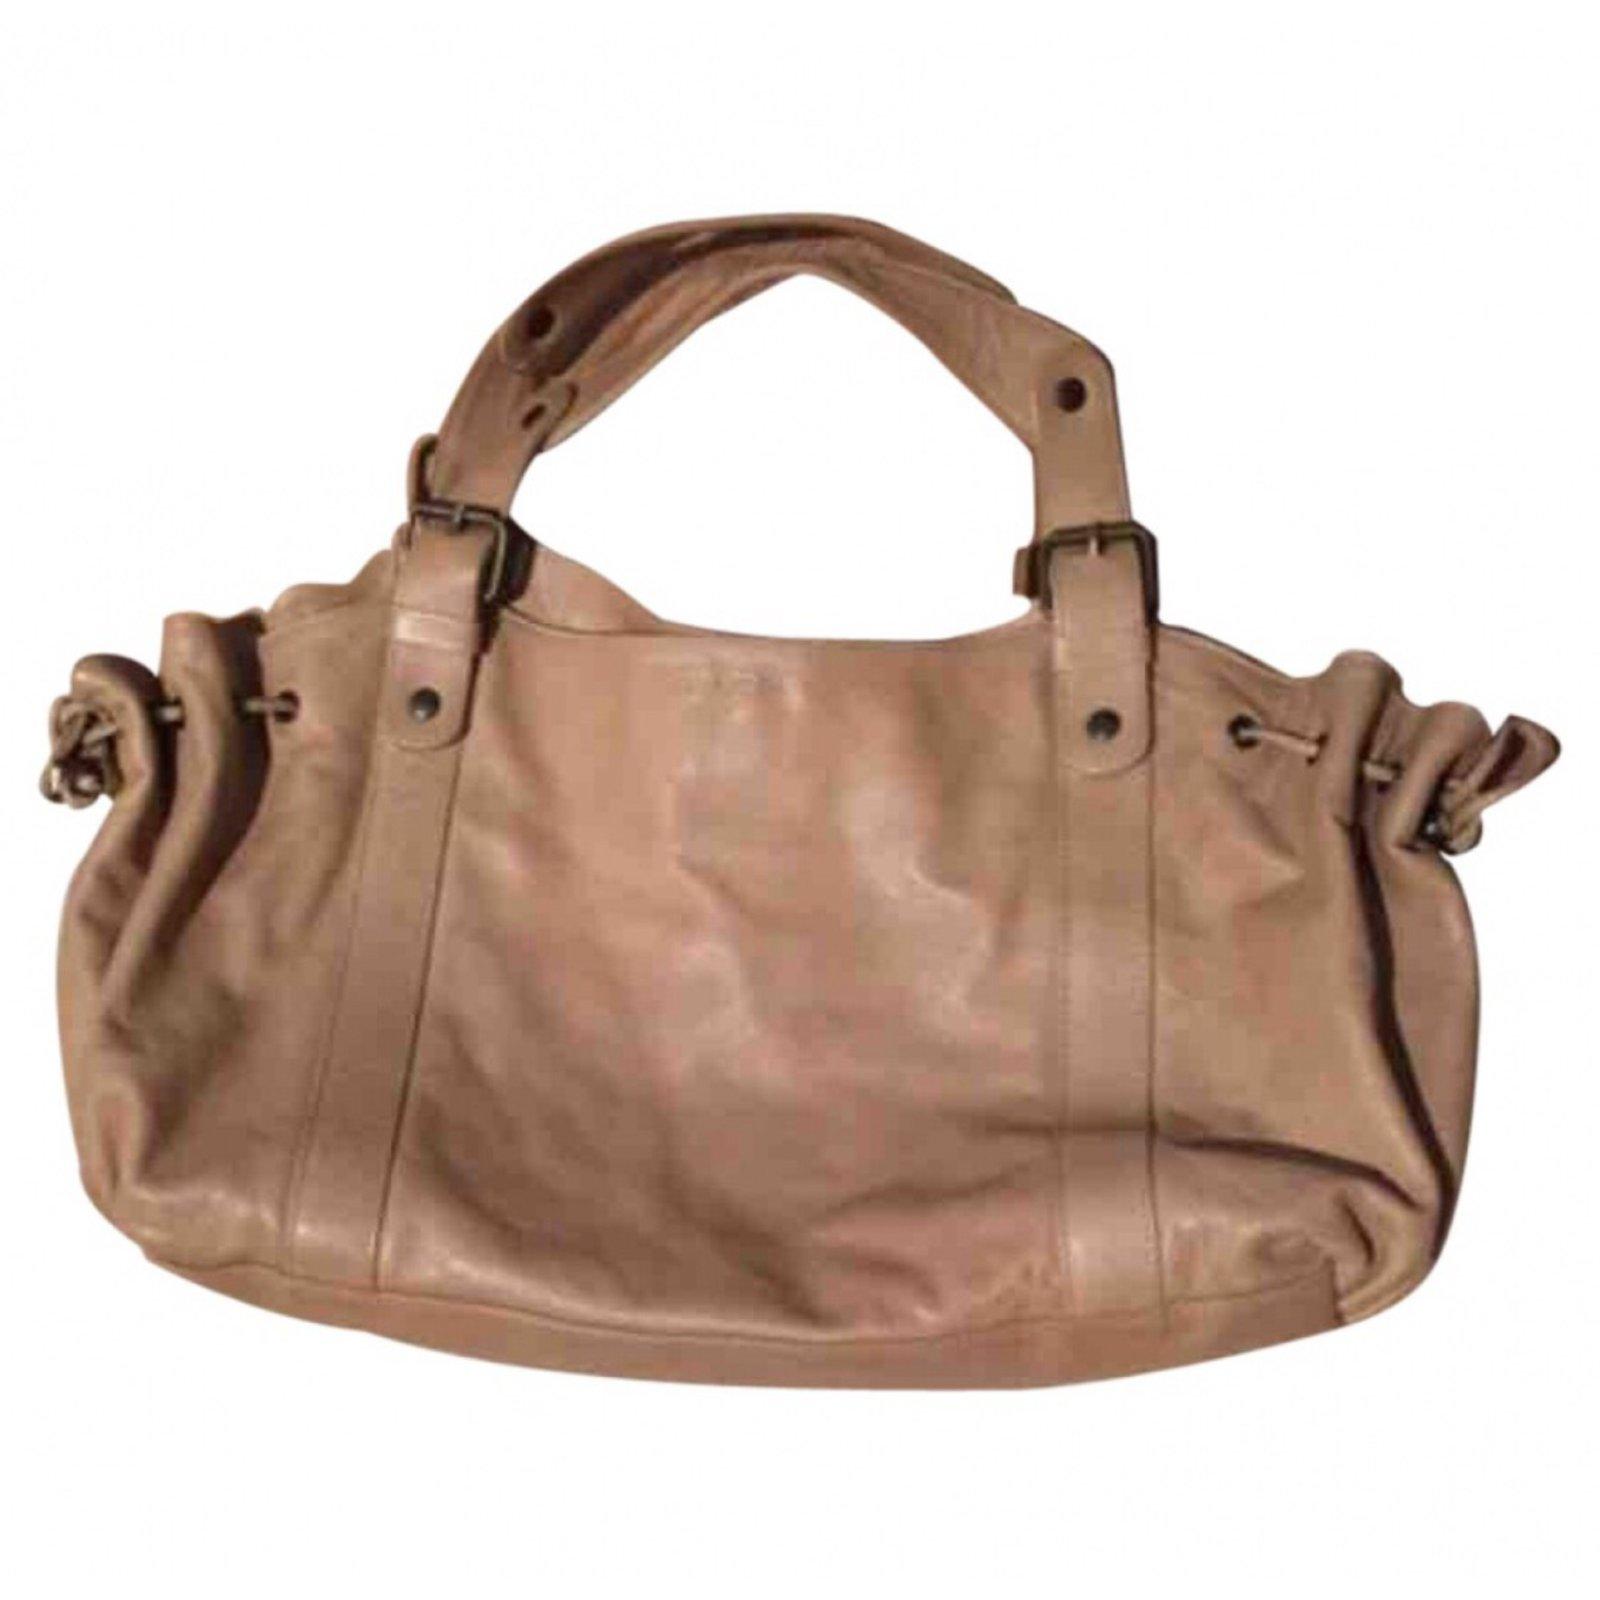 Gerard Darel Handbags Leather Beige Ref 43249